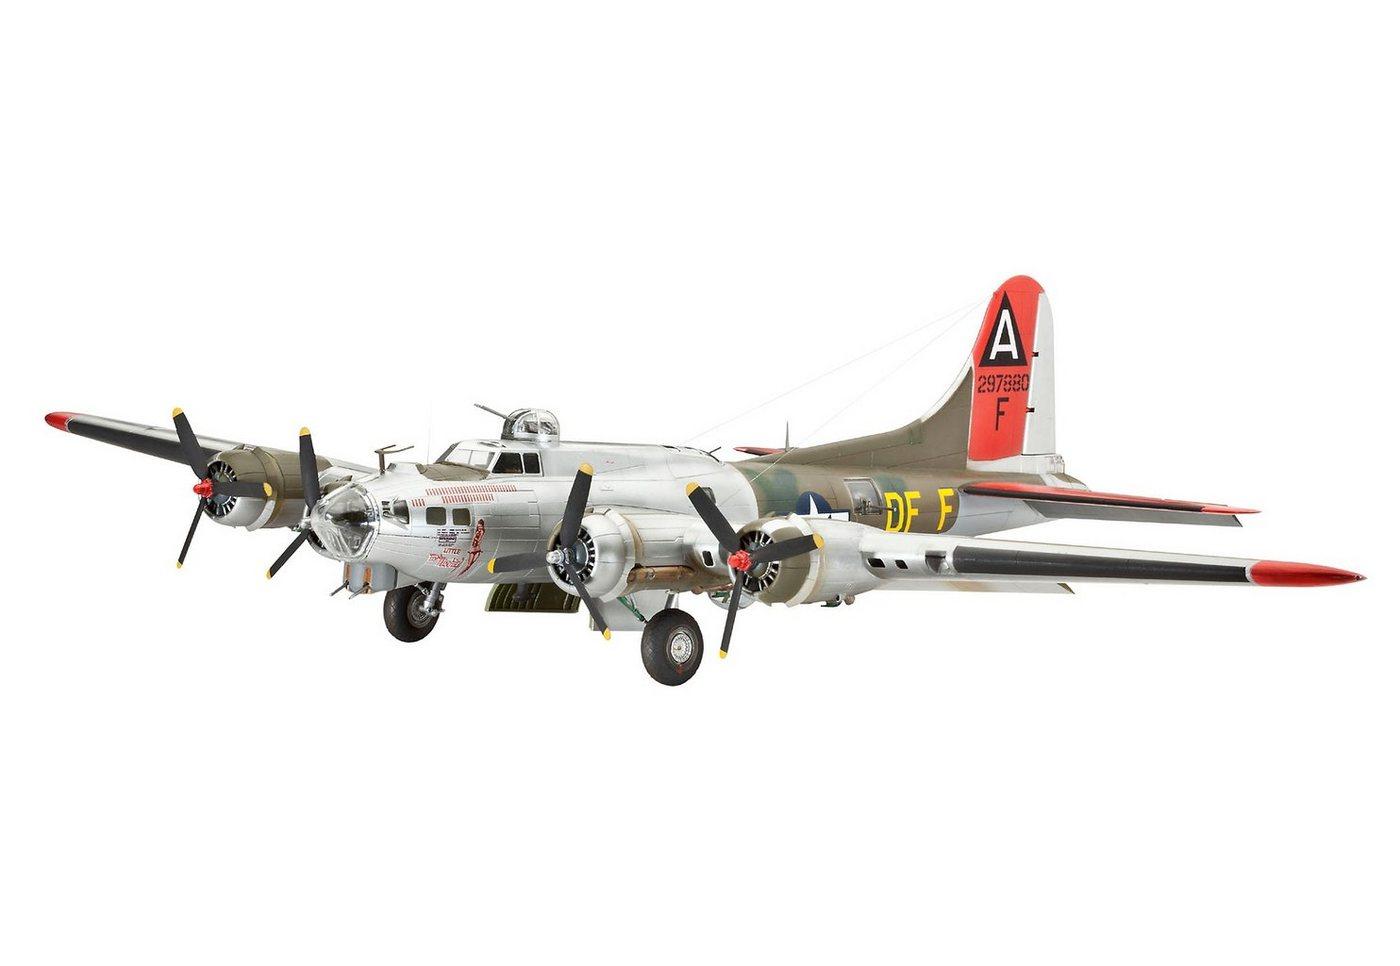 Revell® Modellbausatz Flugzeug, »B-17G Flying Fortress«, Maßstab 1:72